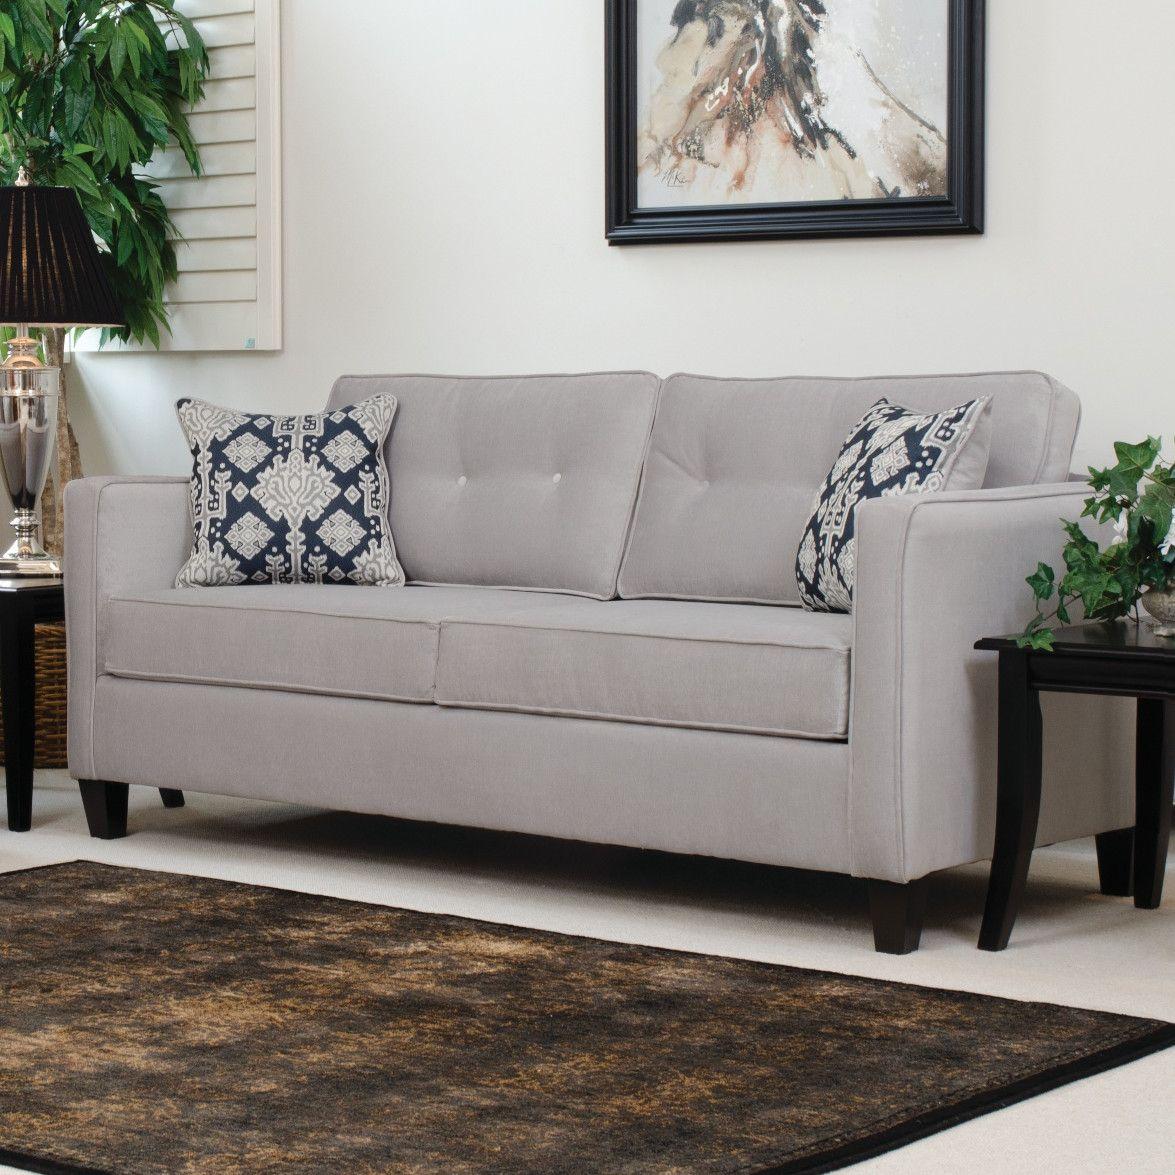 Serta Upholstery Elizabeth Queen Sleeper Sofa